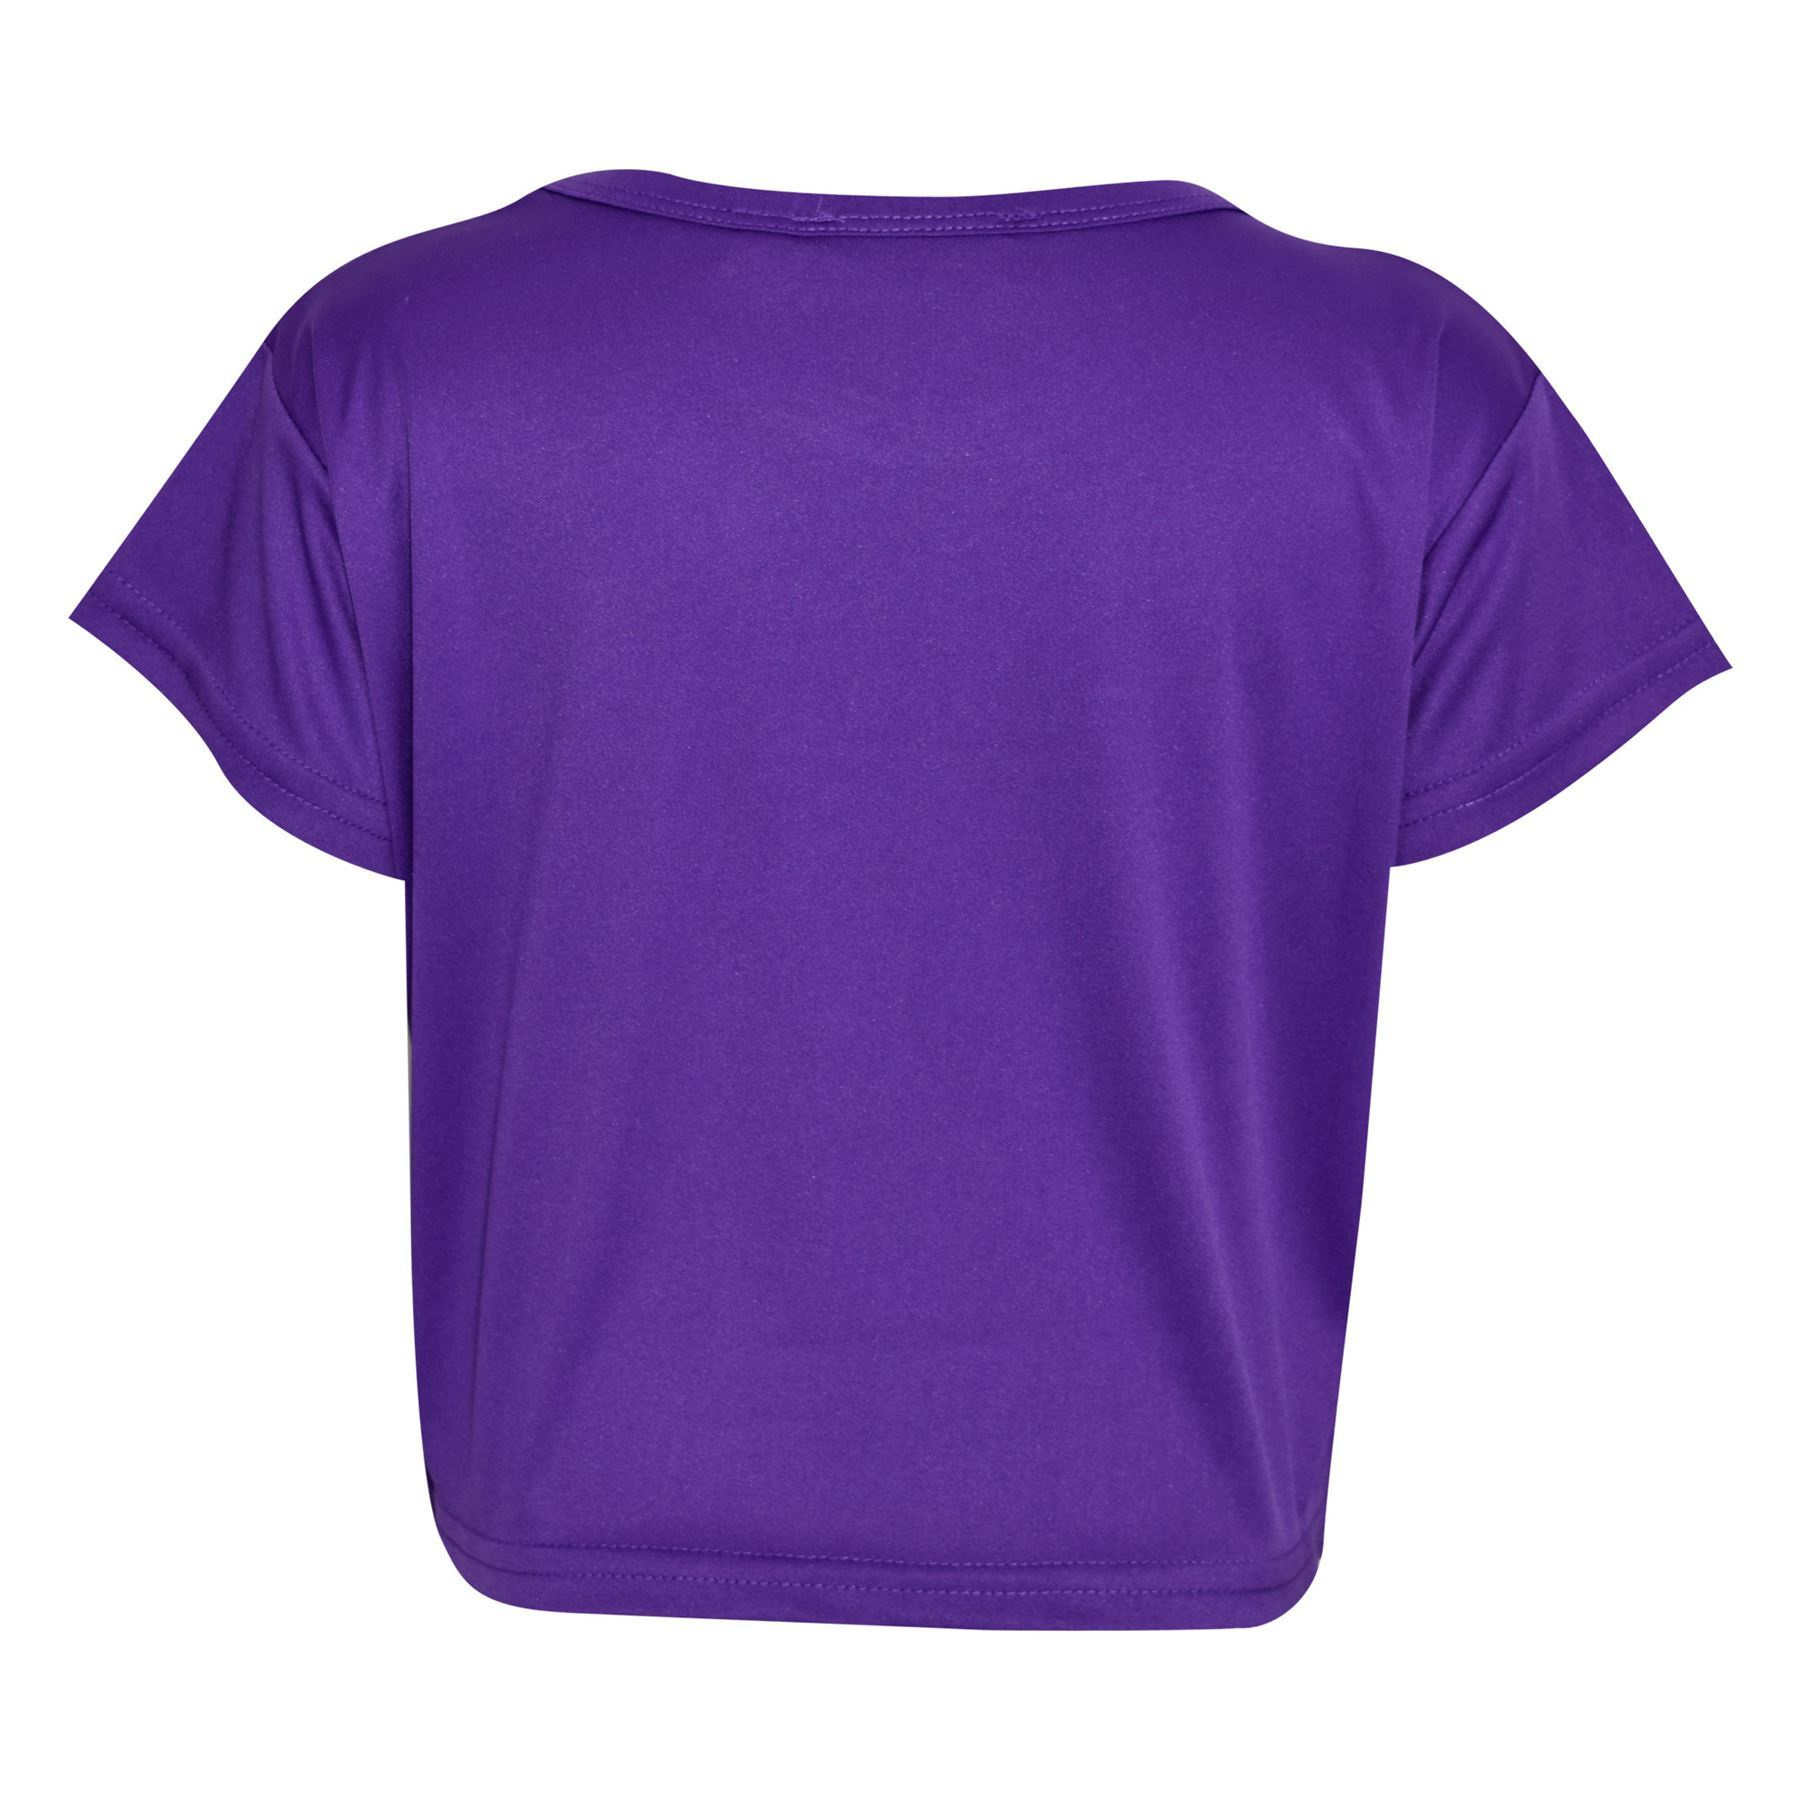 Girls Top Kids Plain Color Stylish Fahsion Trendy T Shirt